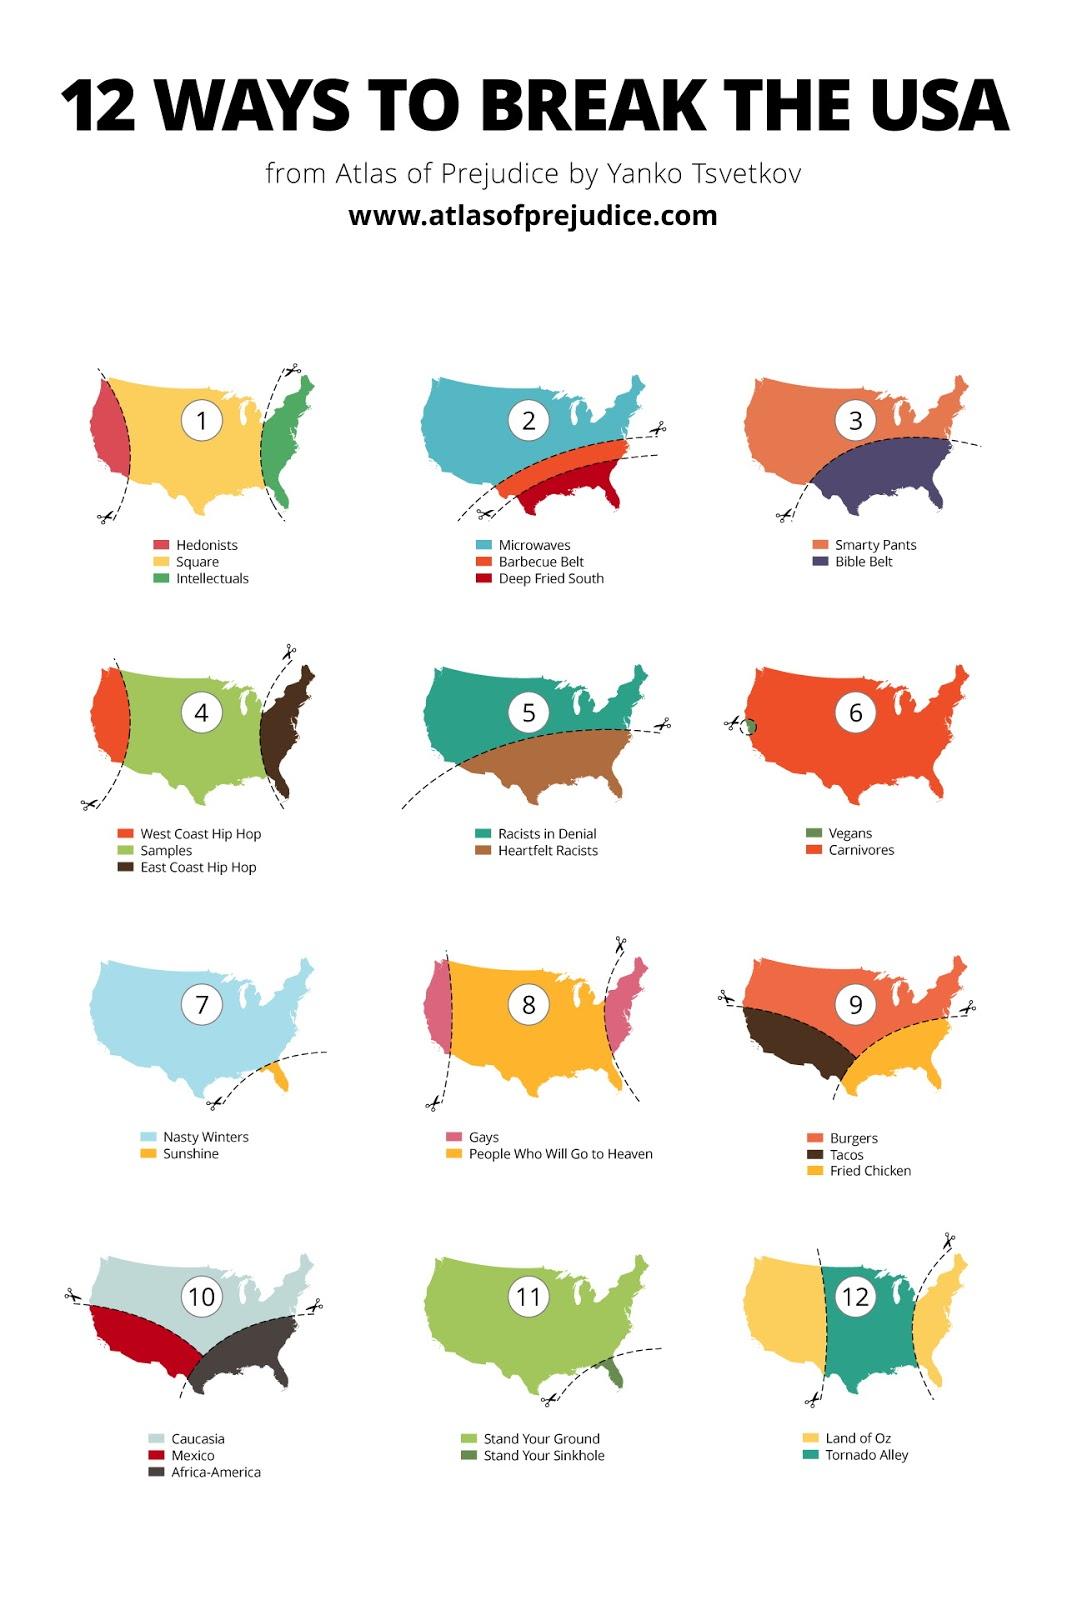 12 Ways to break the USA